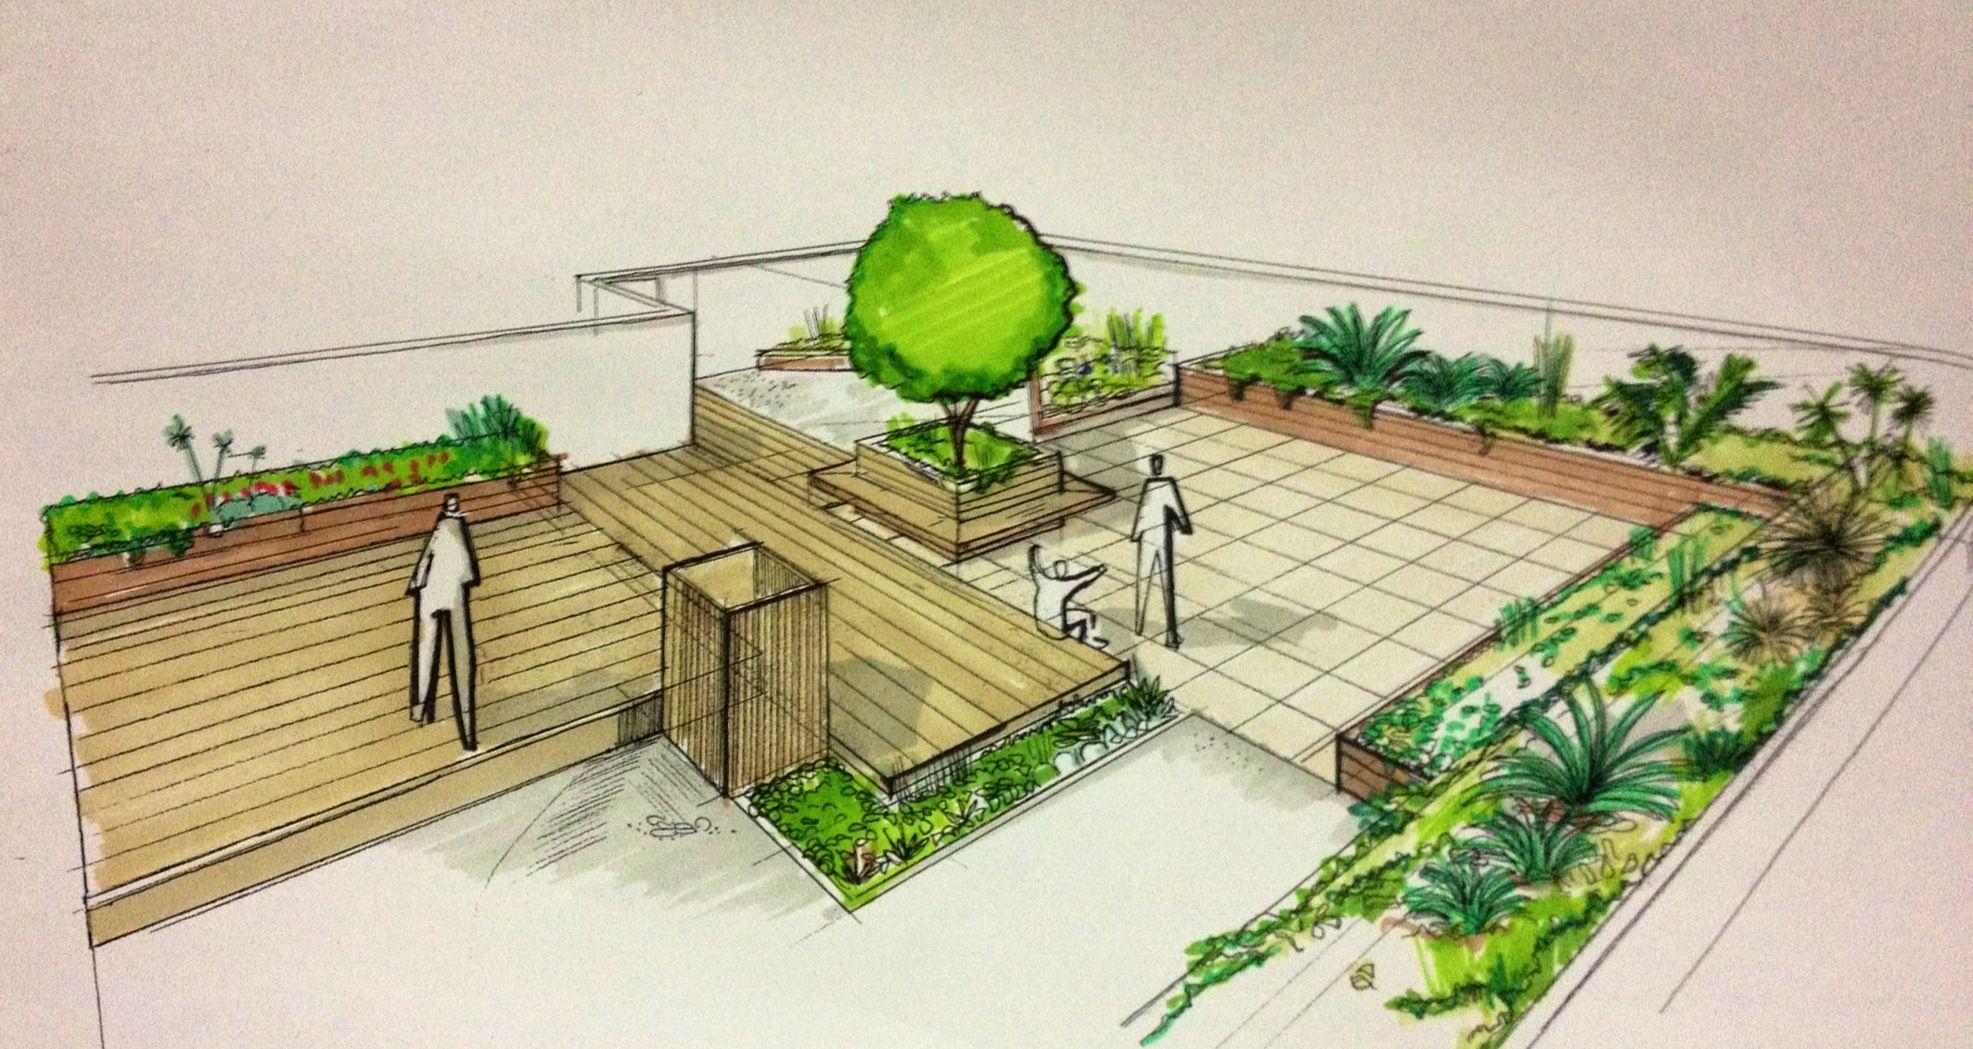 Sketch paisajismo terraza planos pinterest for Paisajismo terrazas